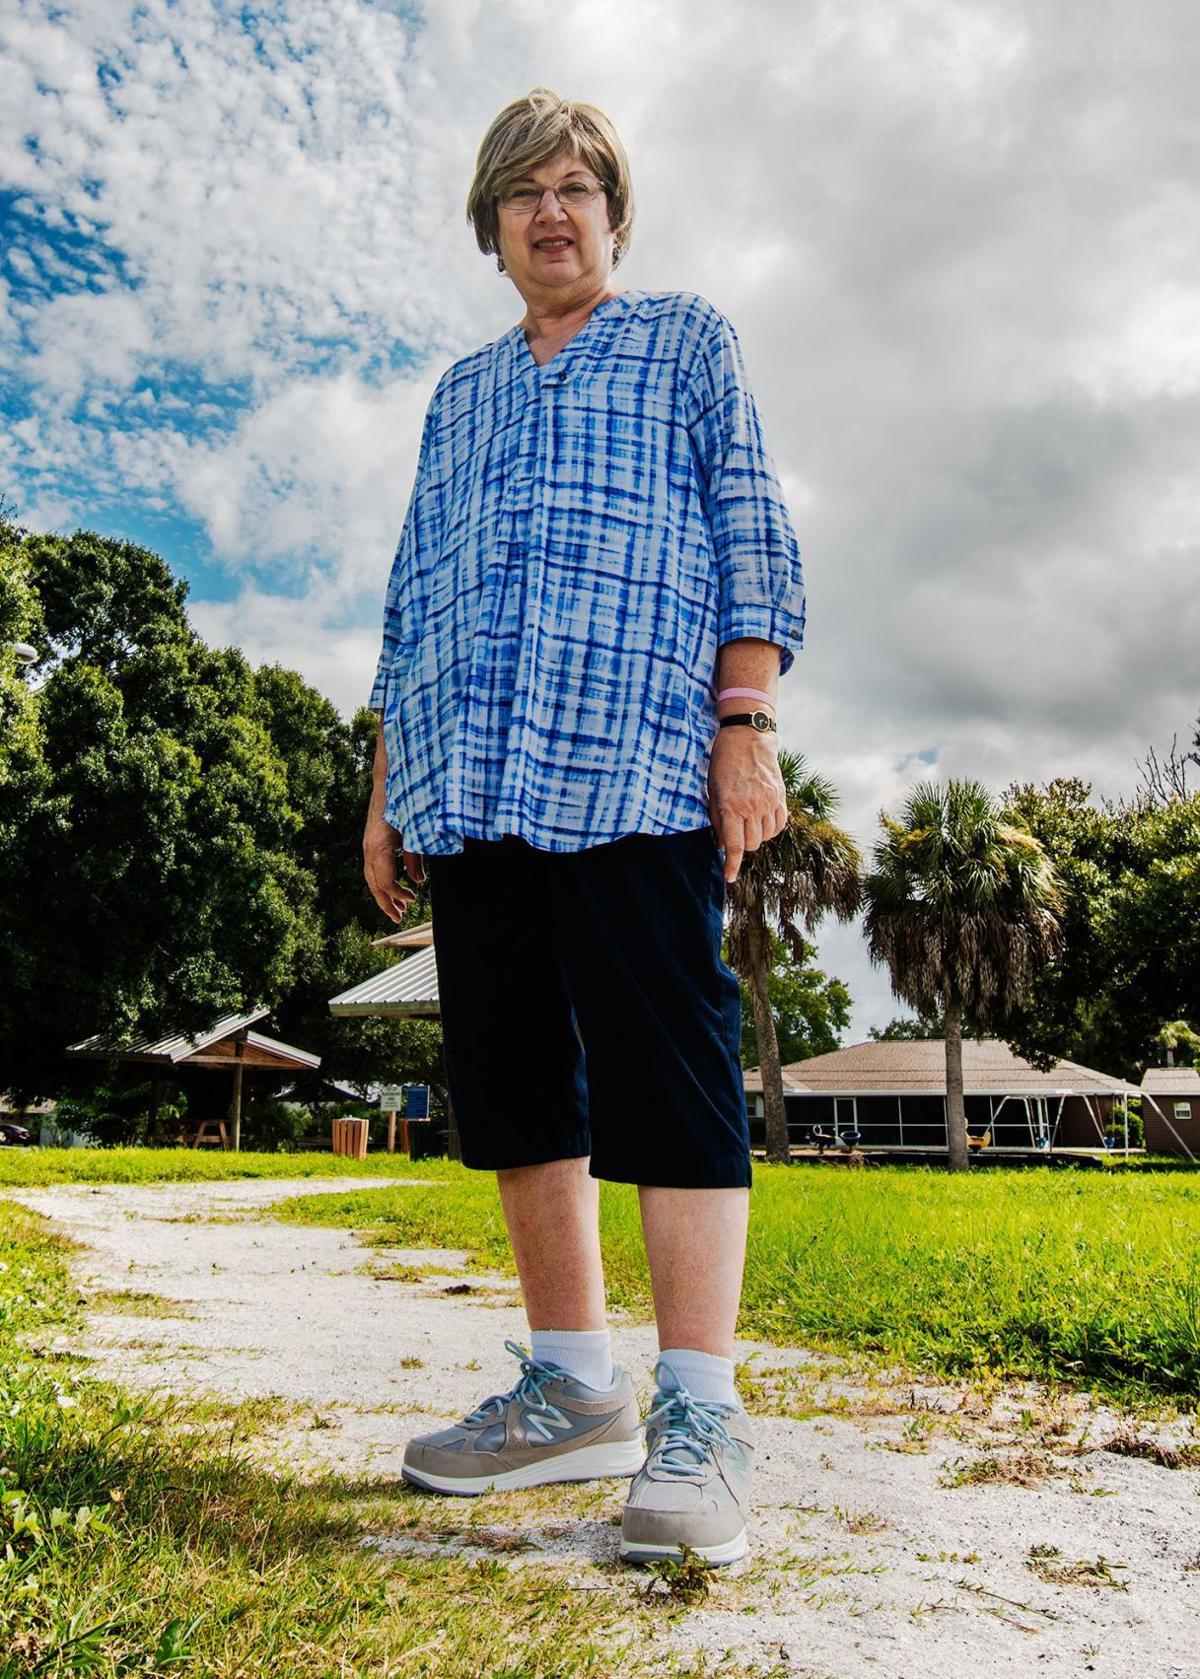 A Survivor's story: Mary Ann Holoska